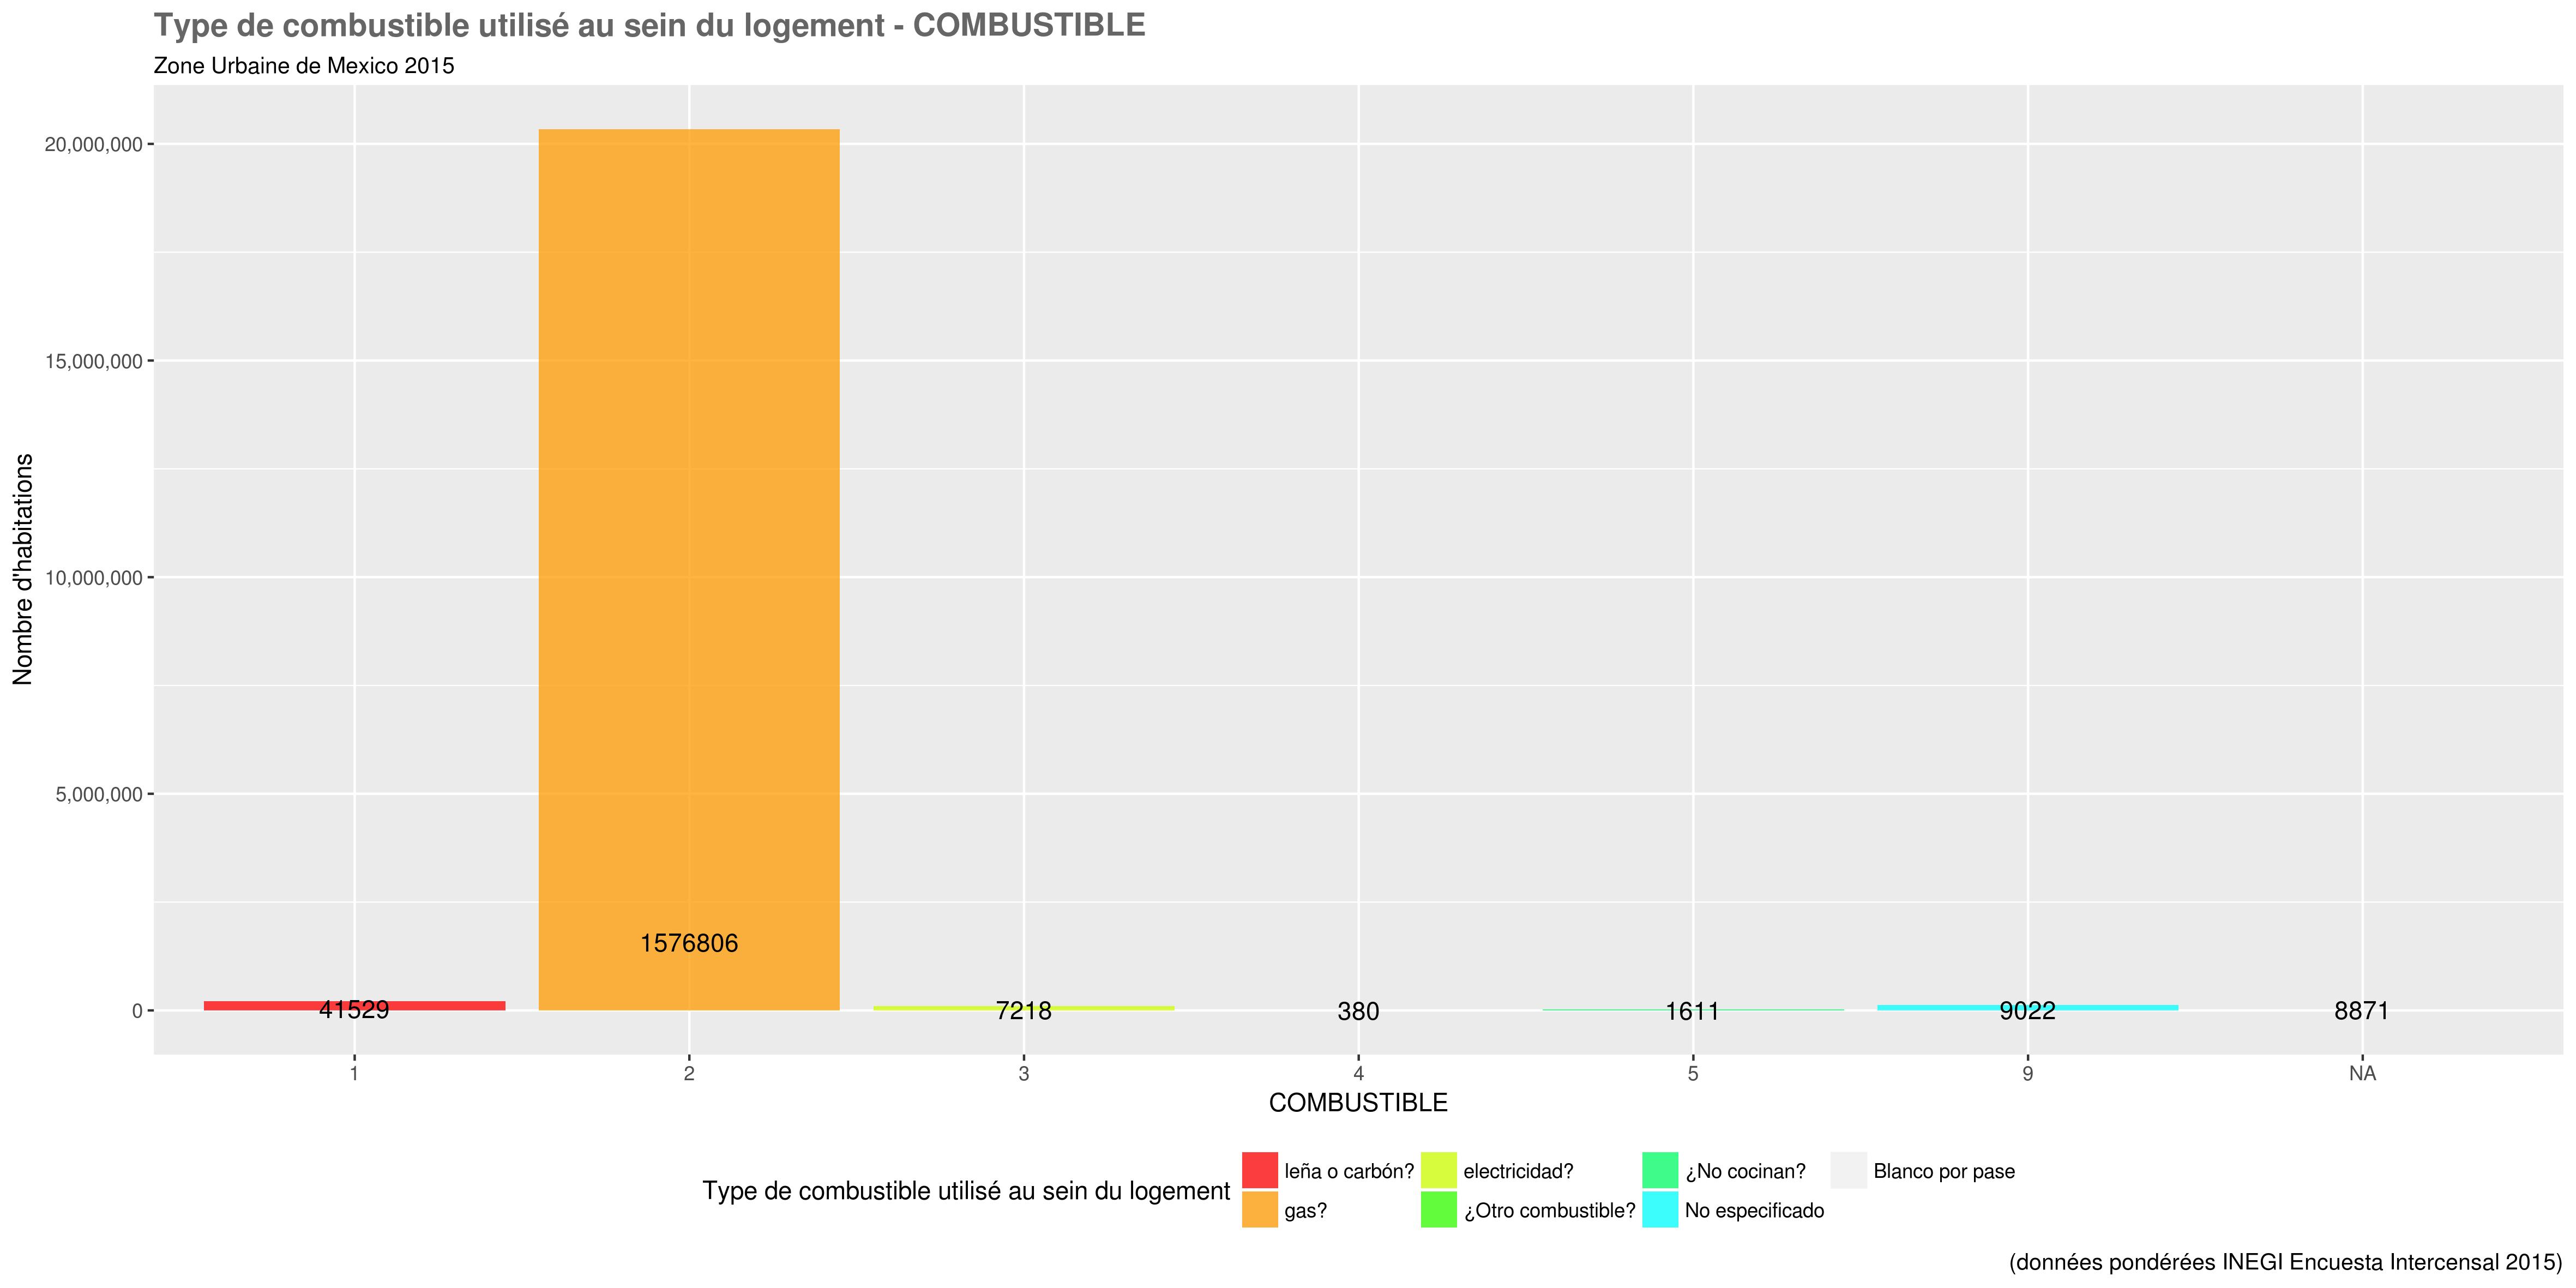 docs/images/distri_variables/COMBUSTIBLE.png